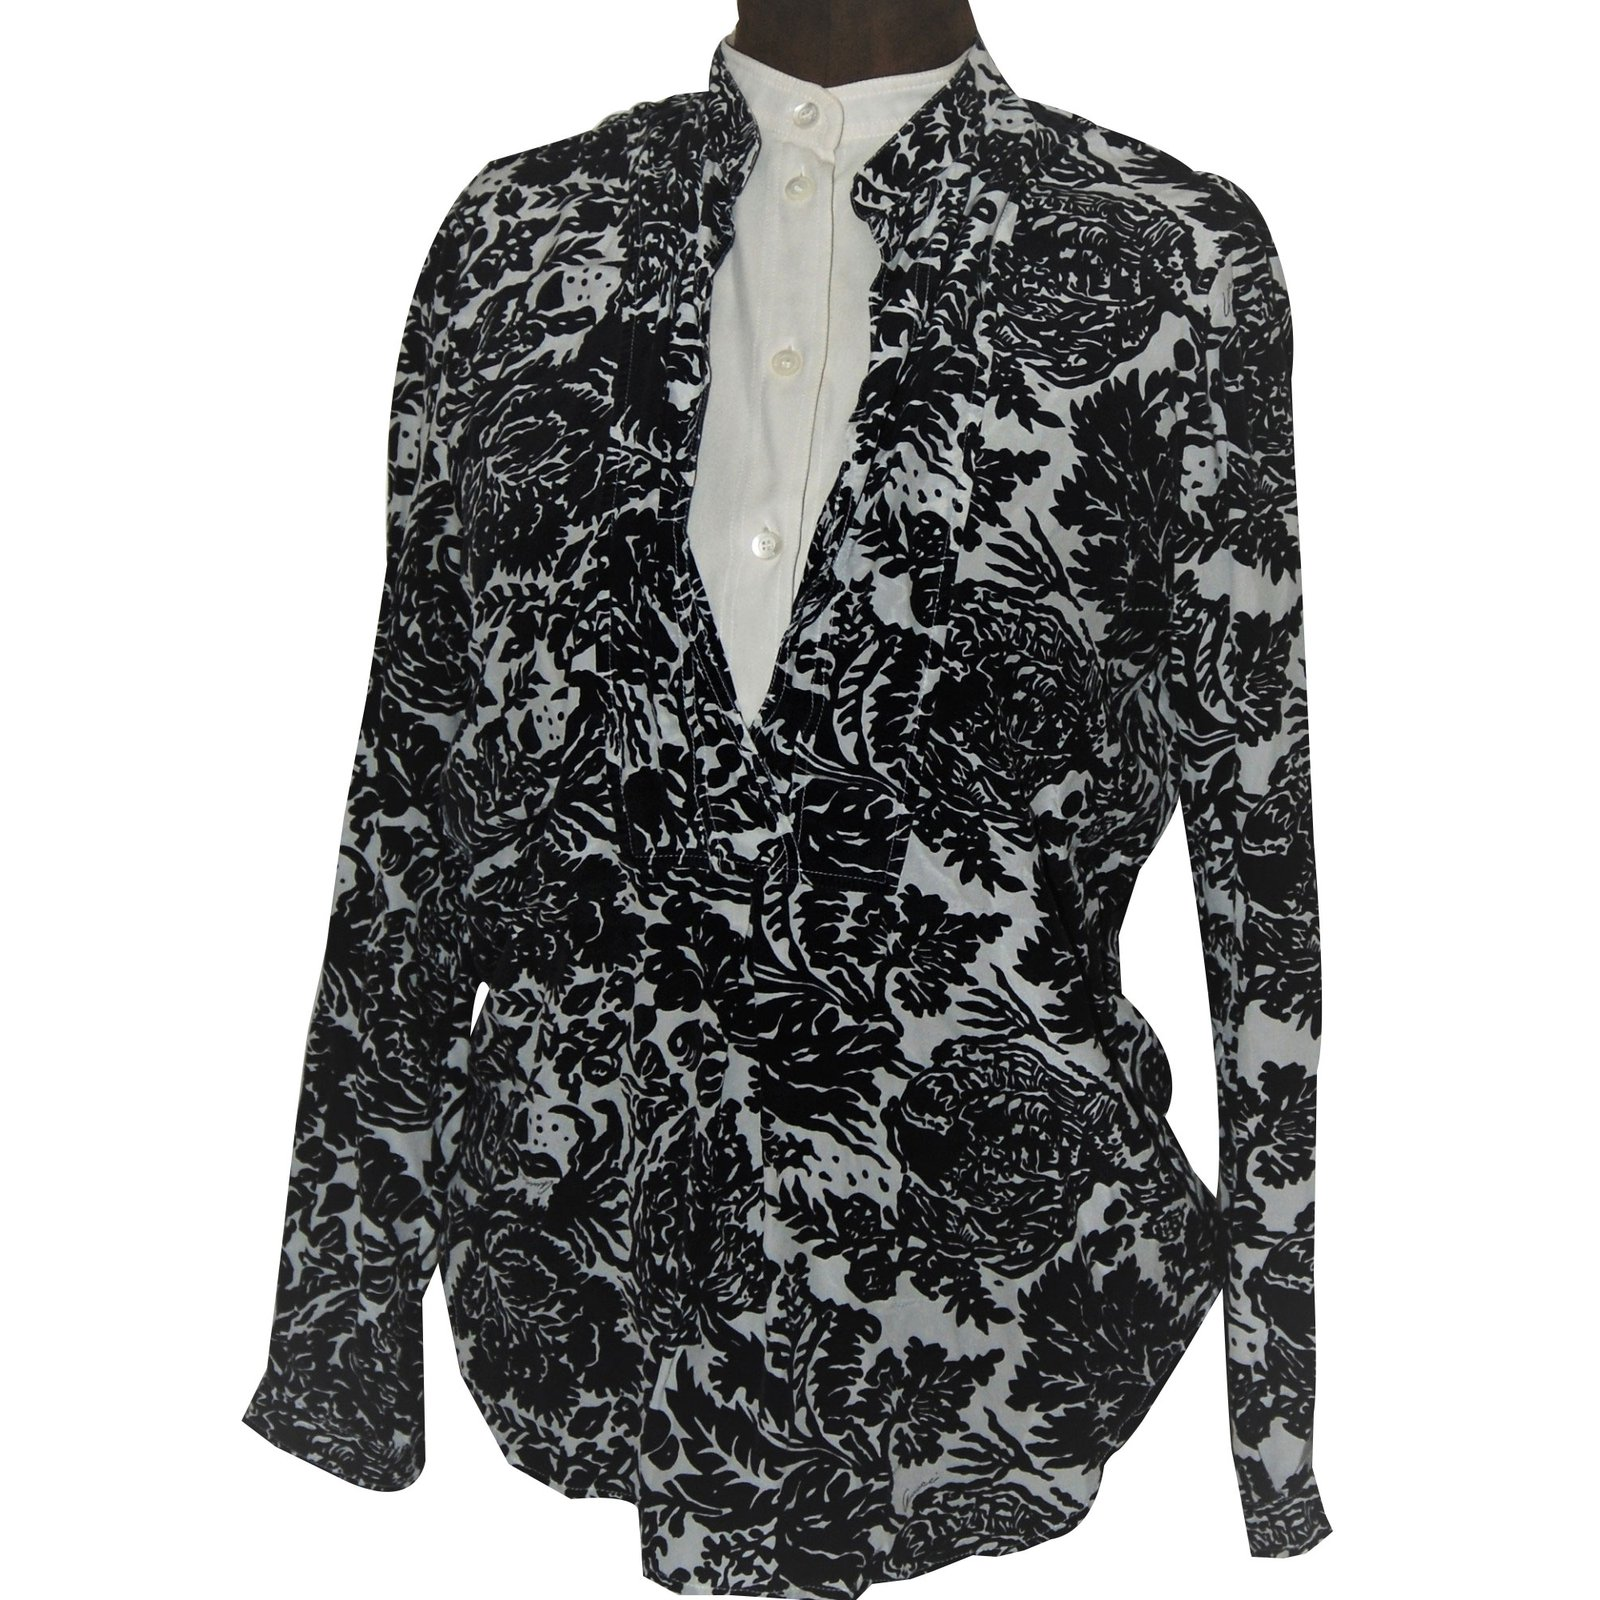 1175cb531 Gucci Tops Tops Silk Black,Eggshell ref.87433 - Joli Closet